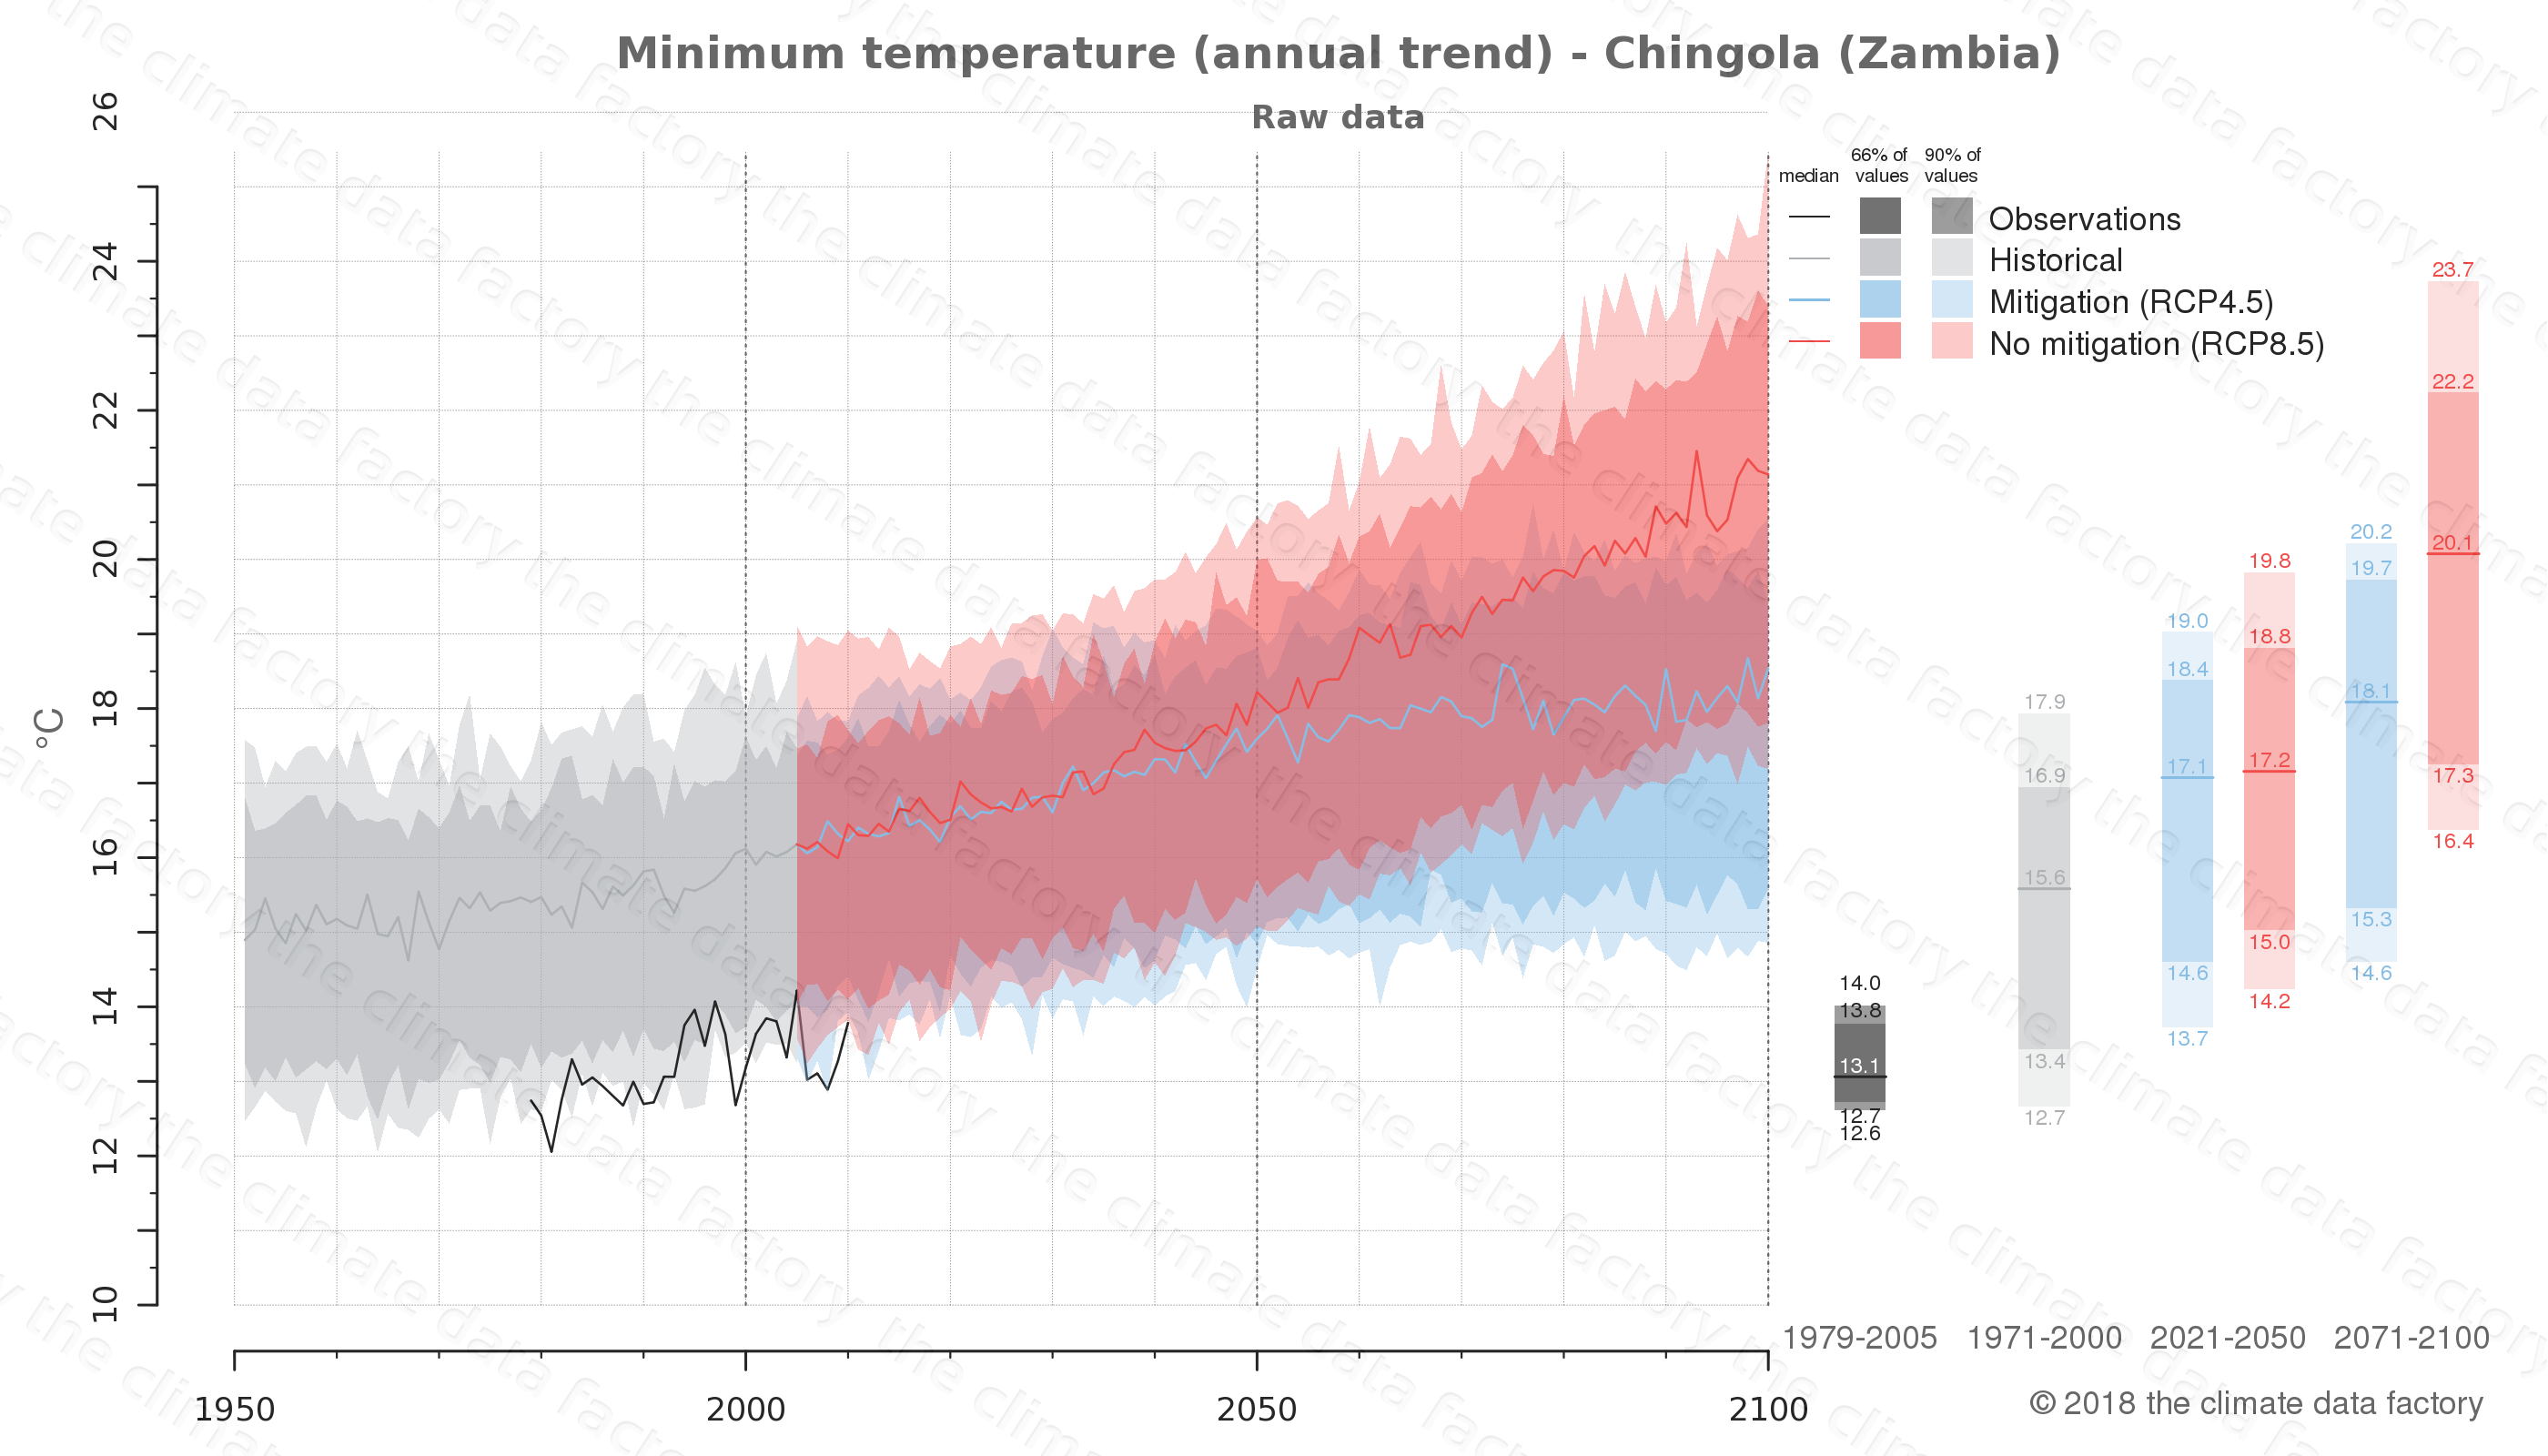 climate change data policy adaptation climate graph city data minimum-temperature chingola zambia